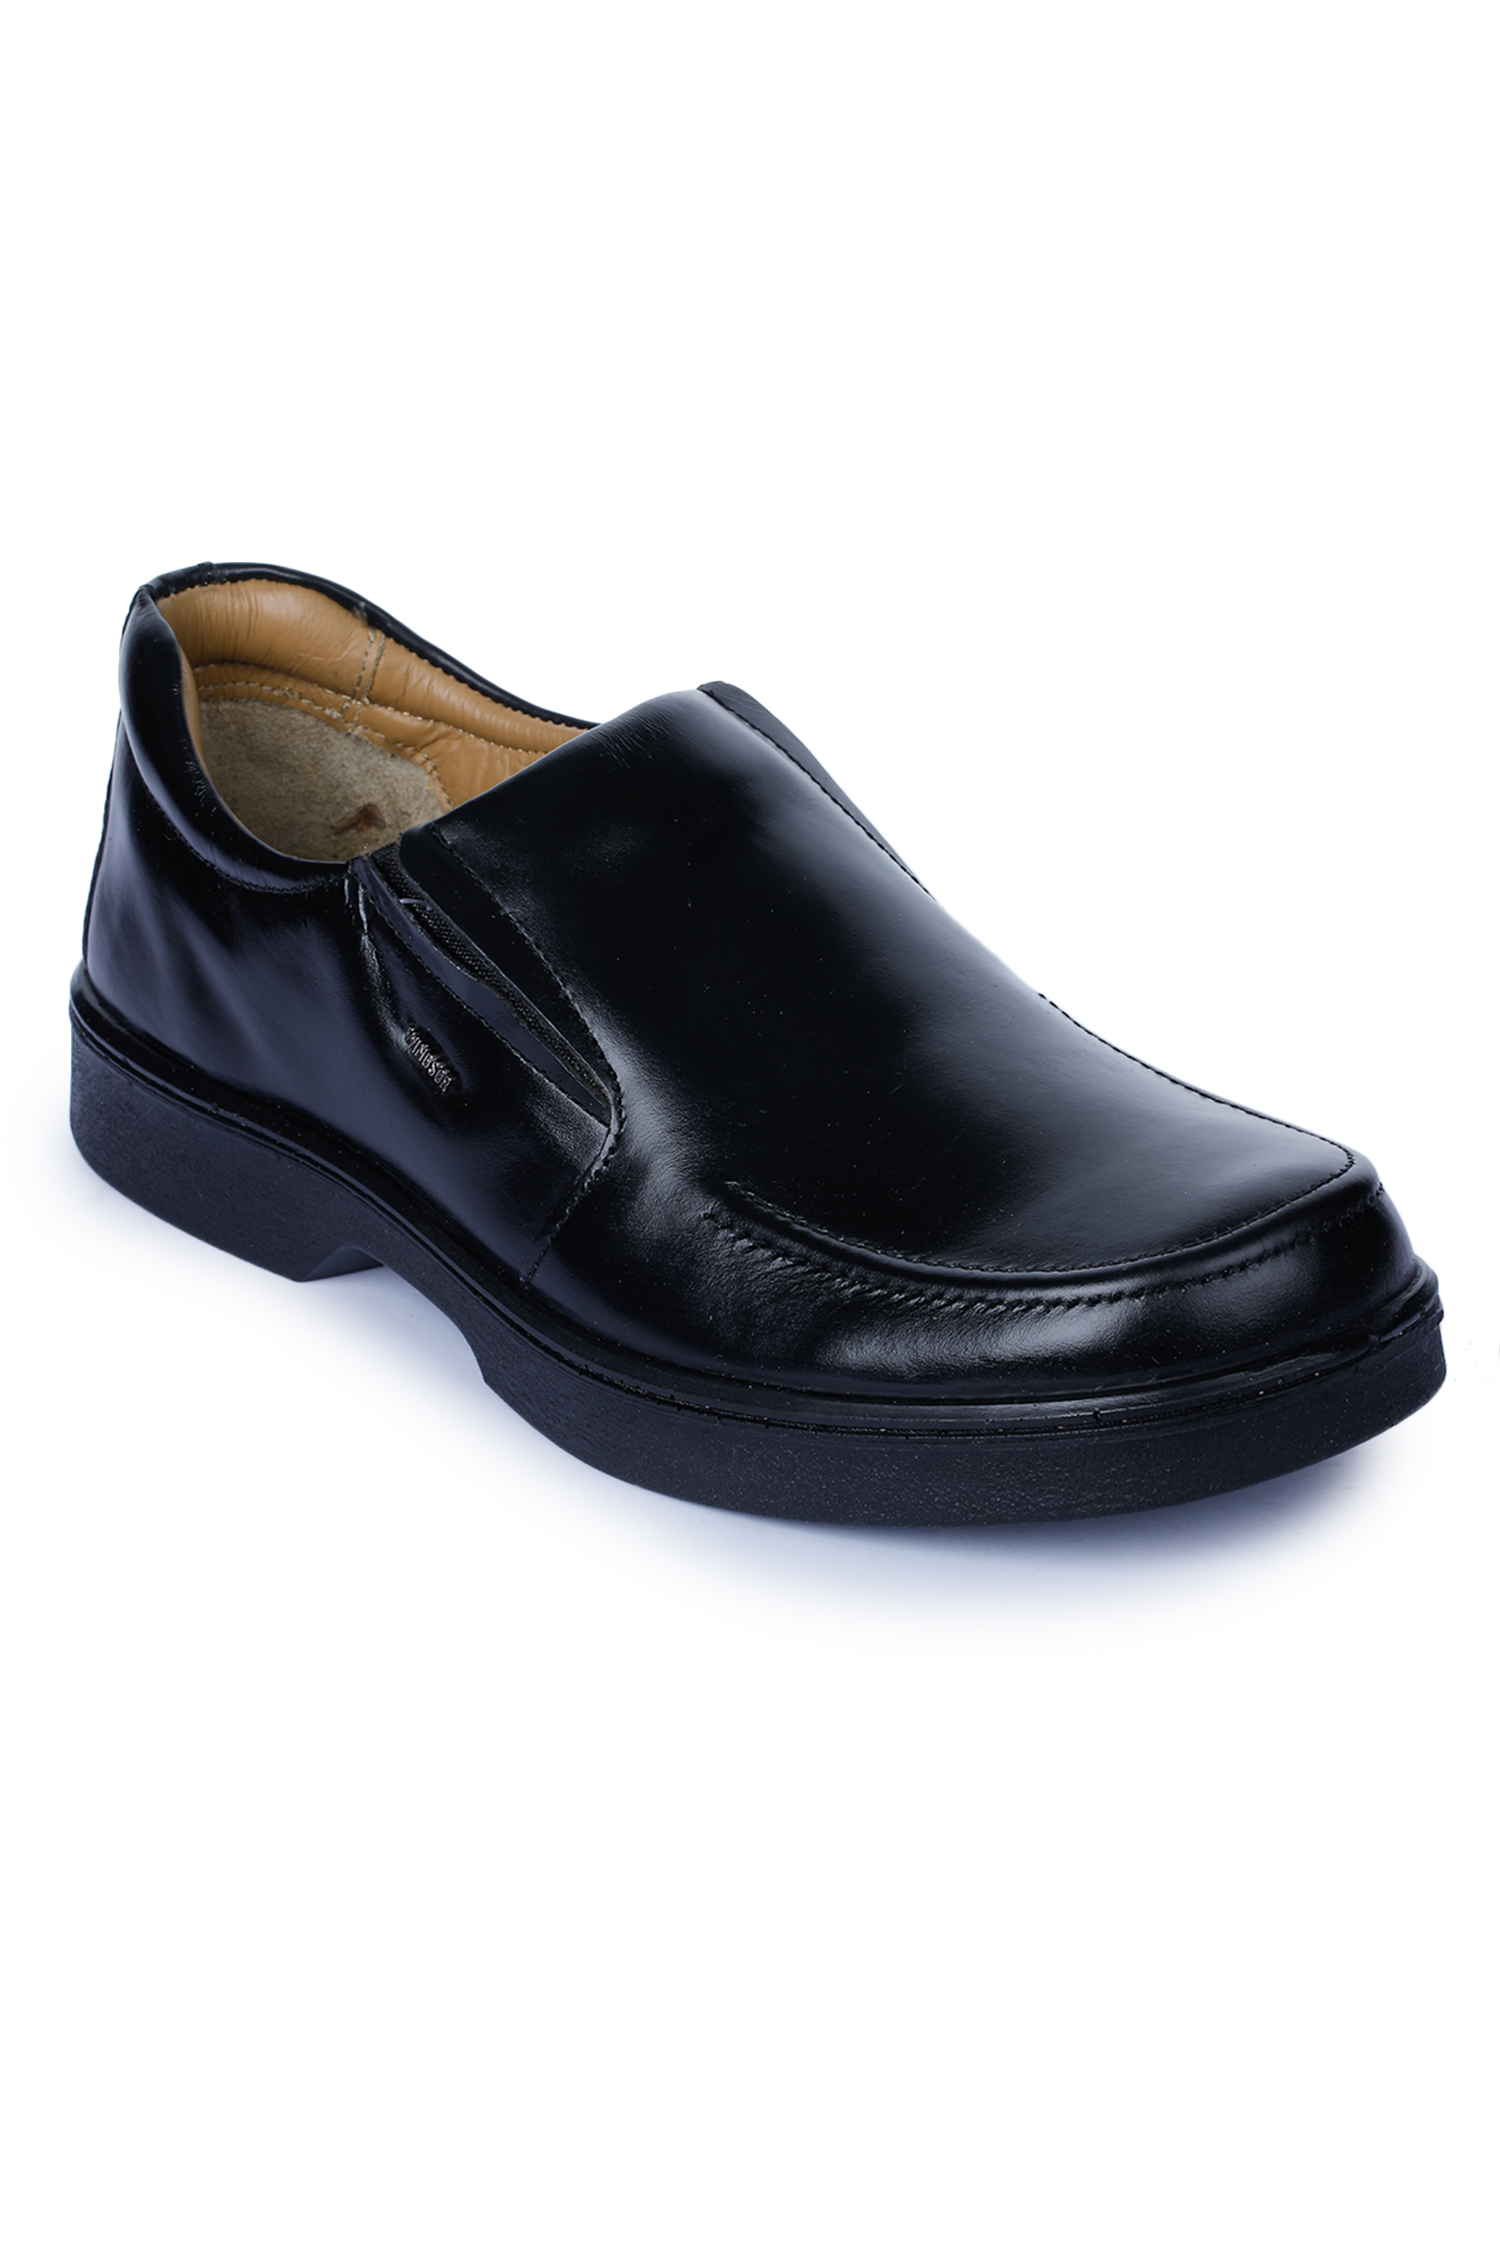 Liberty   Liberty WINDSOR Formal Slip-ons 2046-08_BLACK For - Men